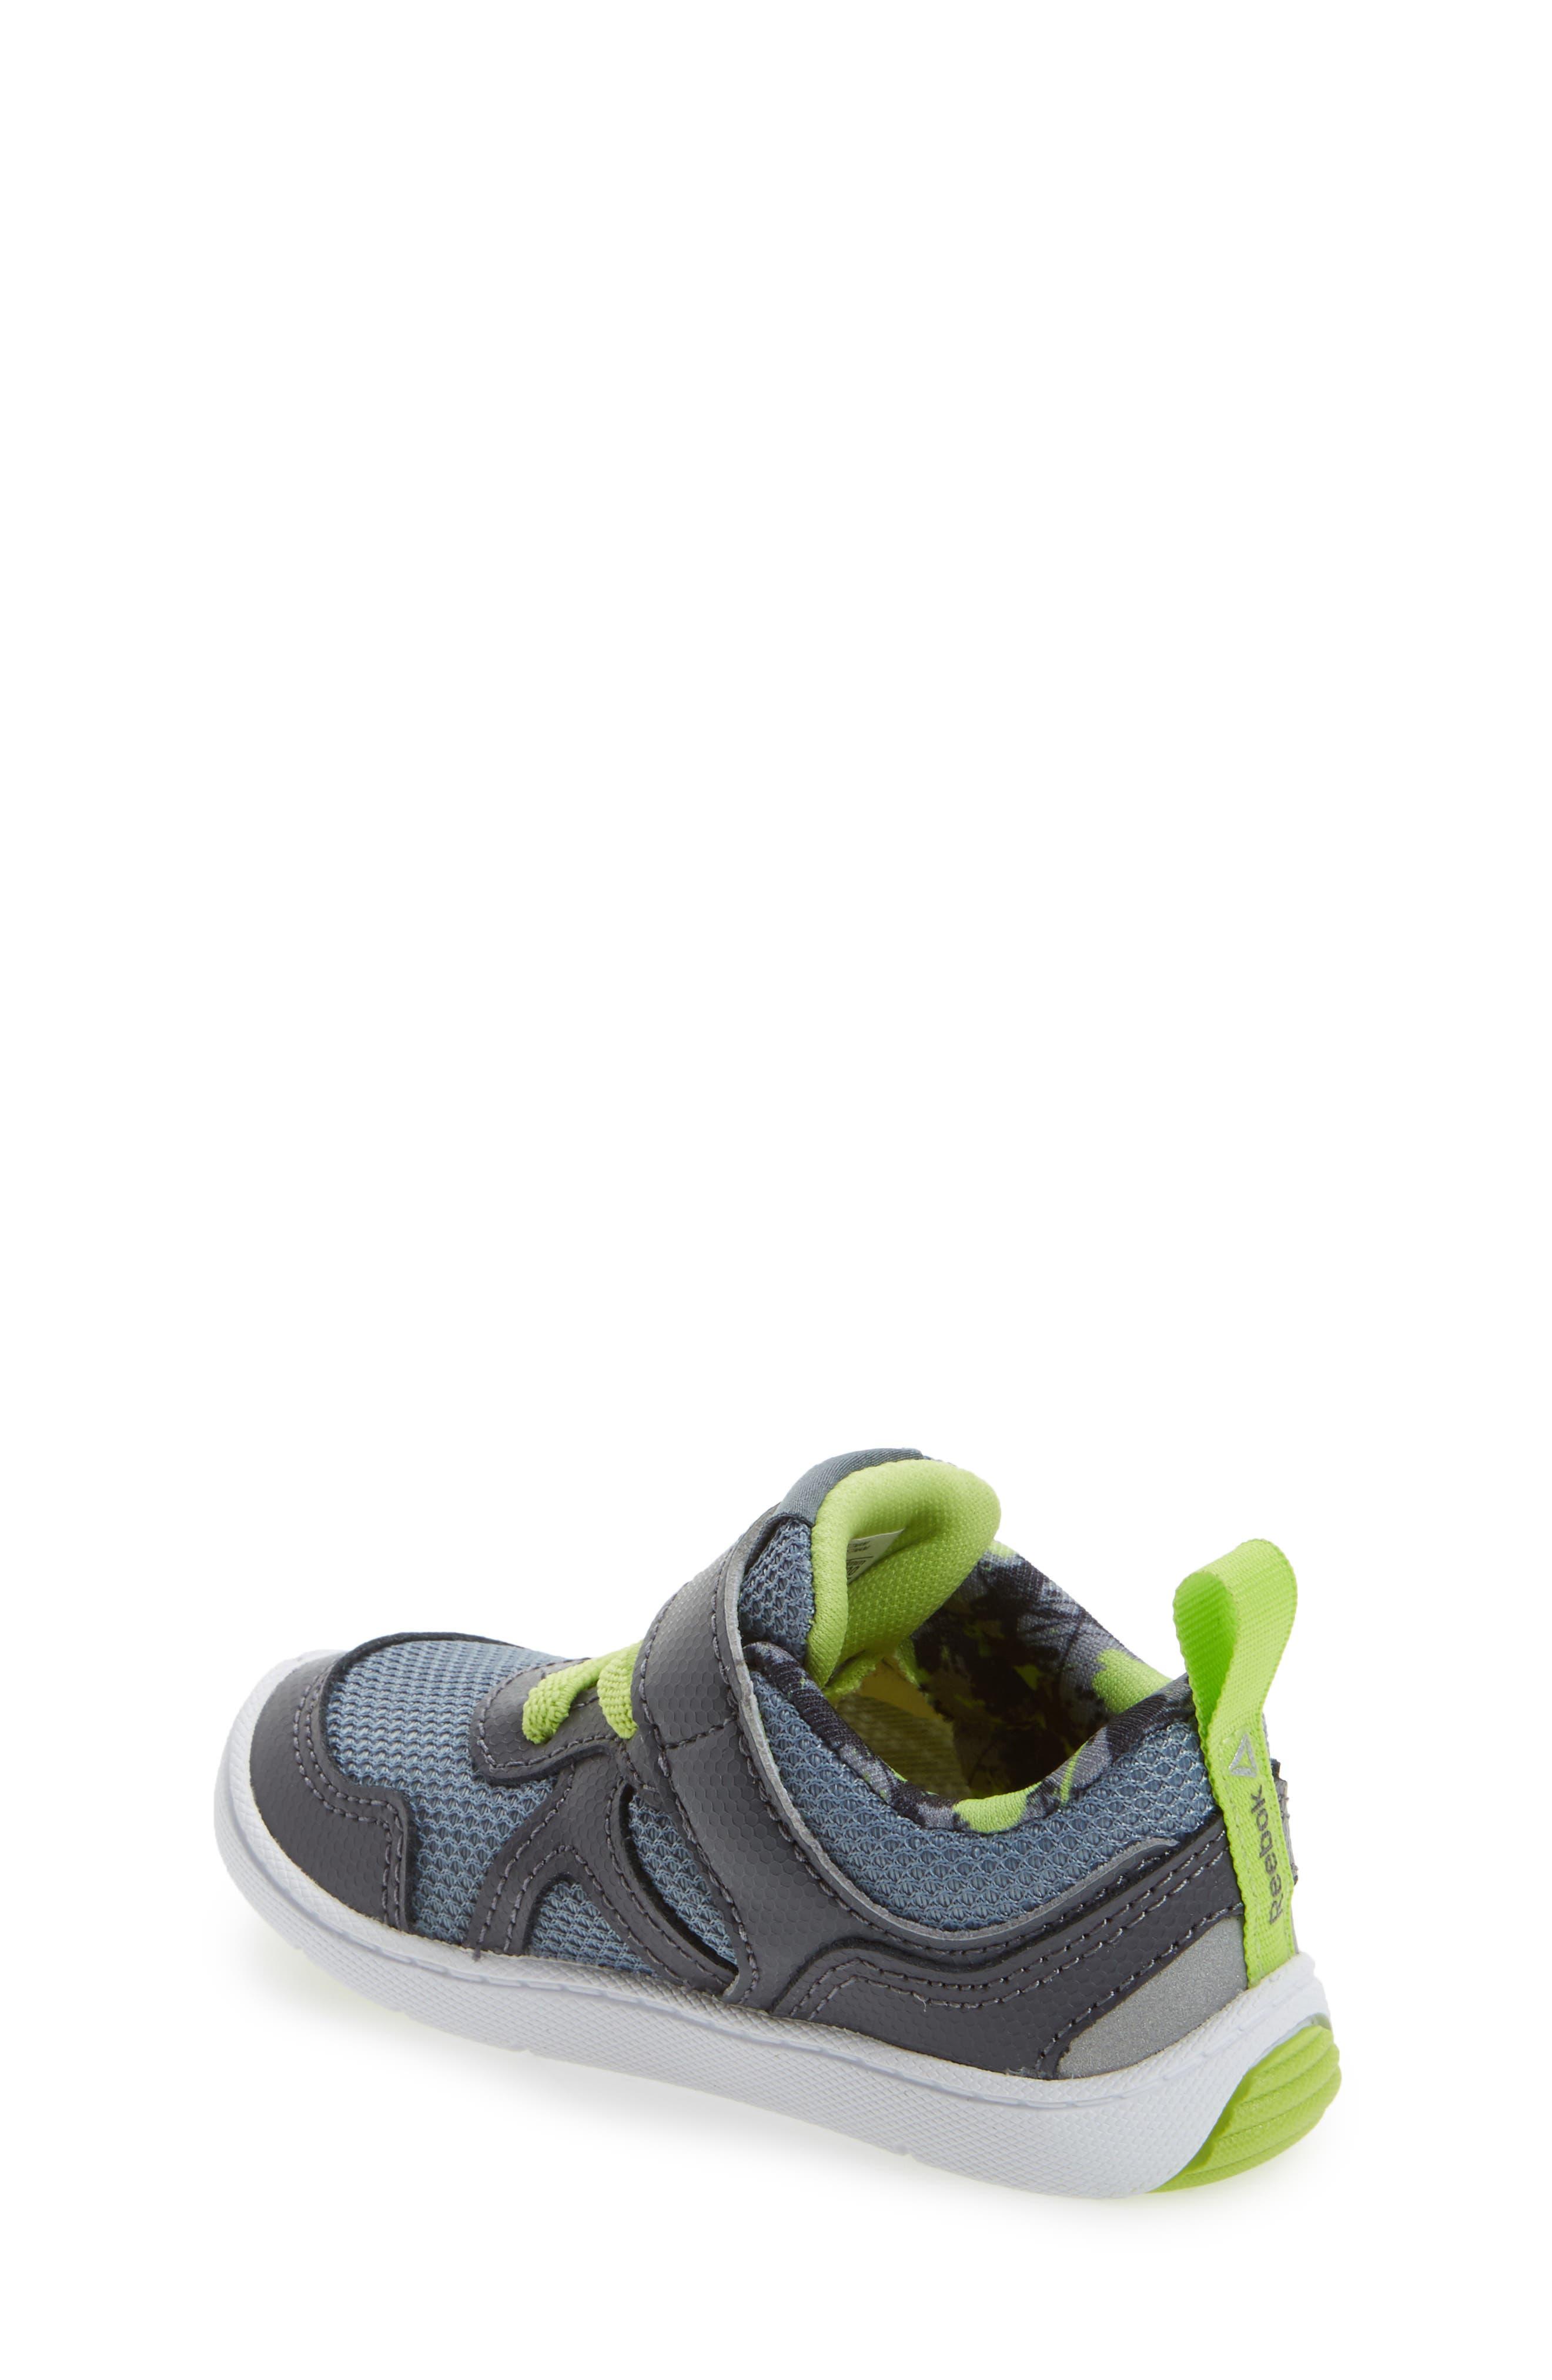 Ventureflex Stride 5.0 Sneaker,                             Alternate thumbnail 2, color,                             020